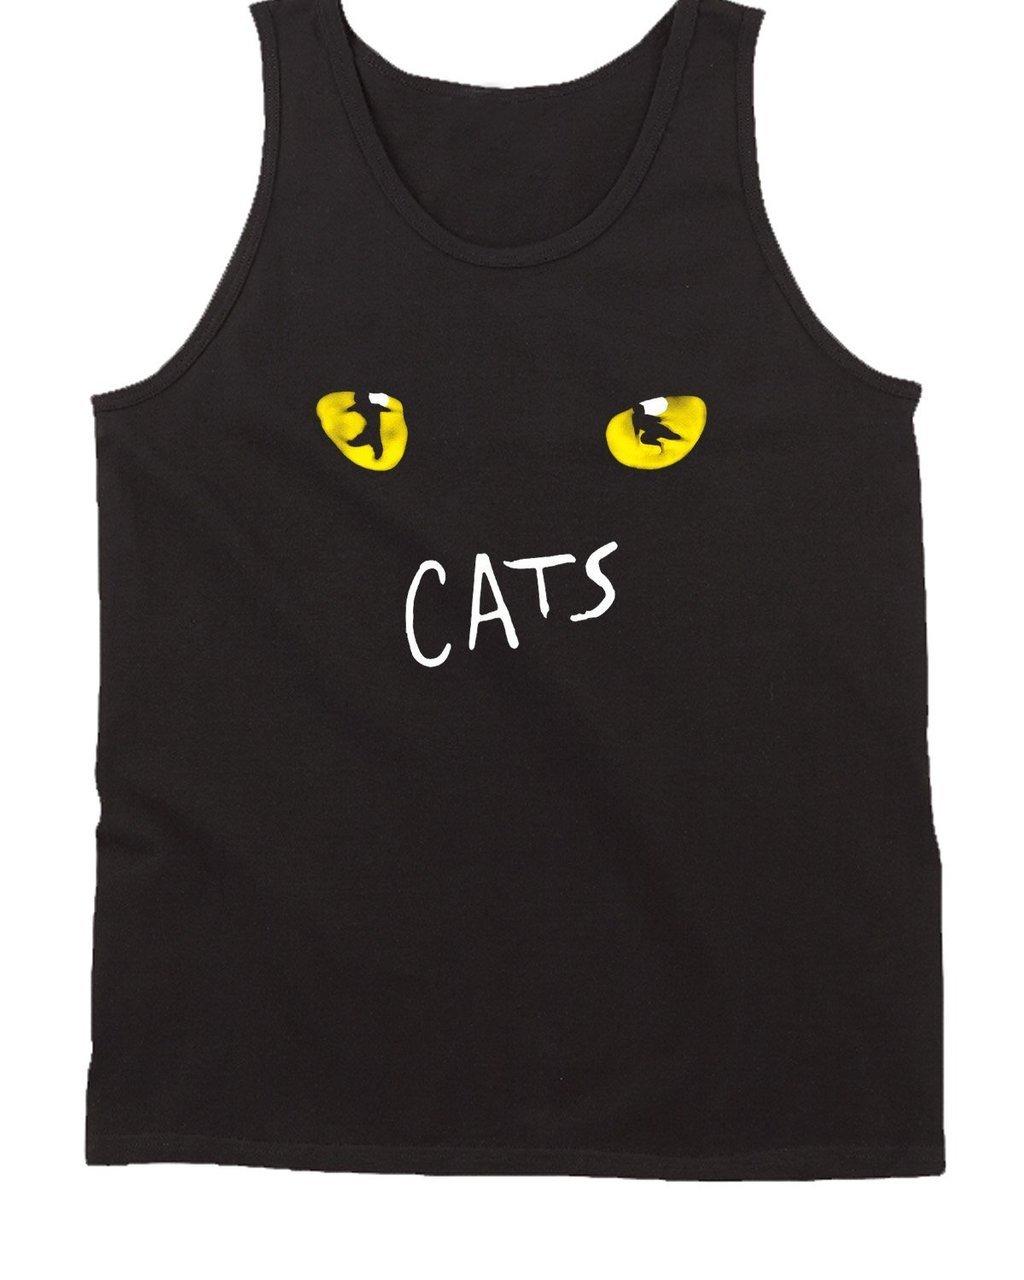 Cats Broadway Musical Show Tanktop 373692871 Shirts